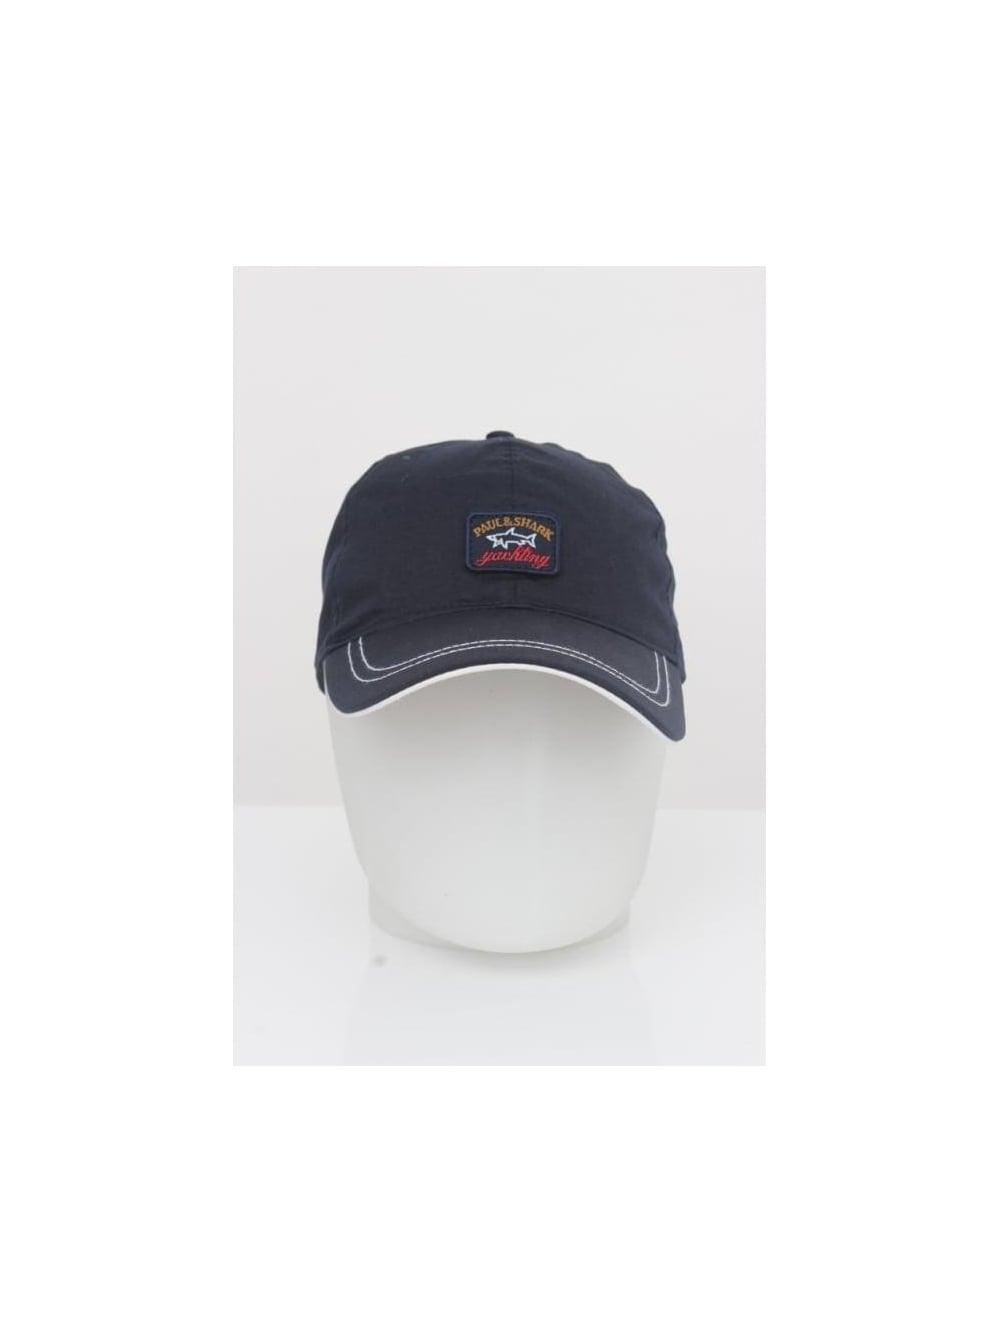 Paul and Shark Logo Cap - Navy